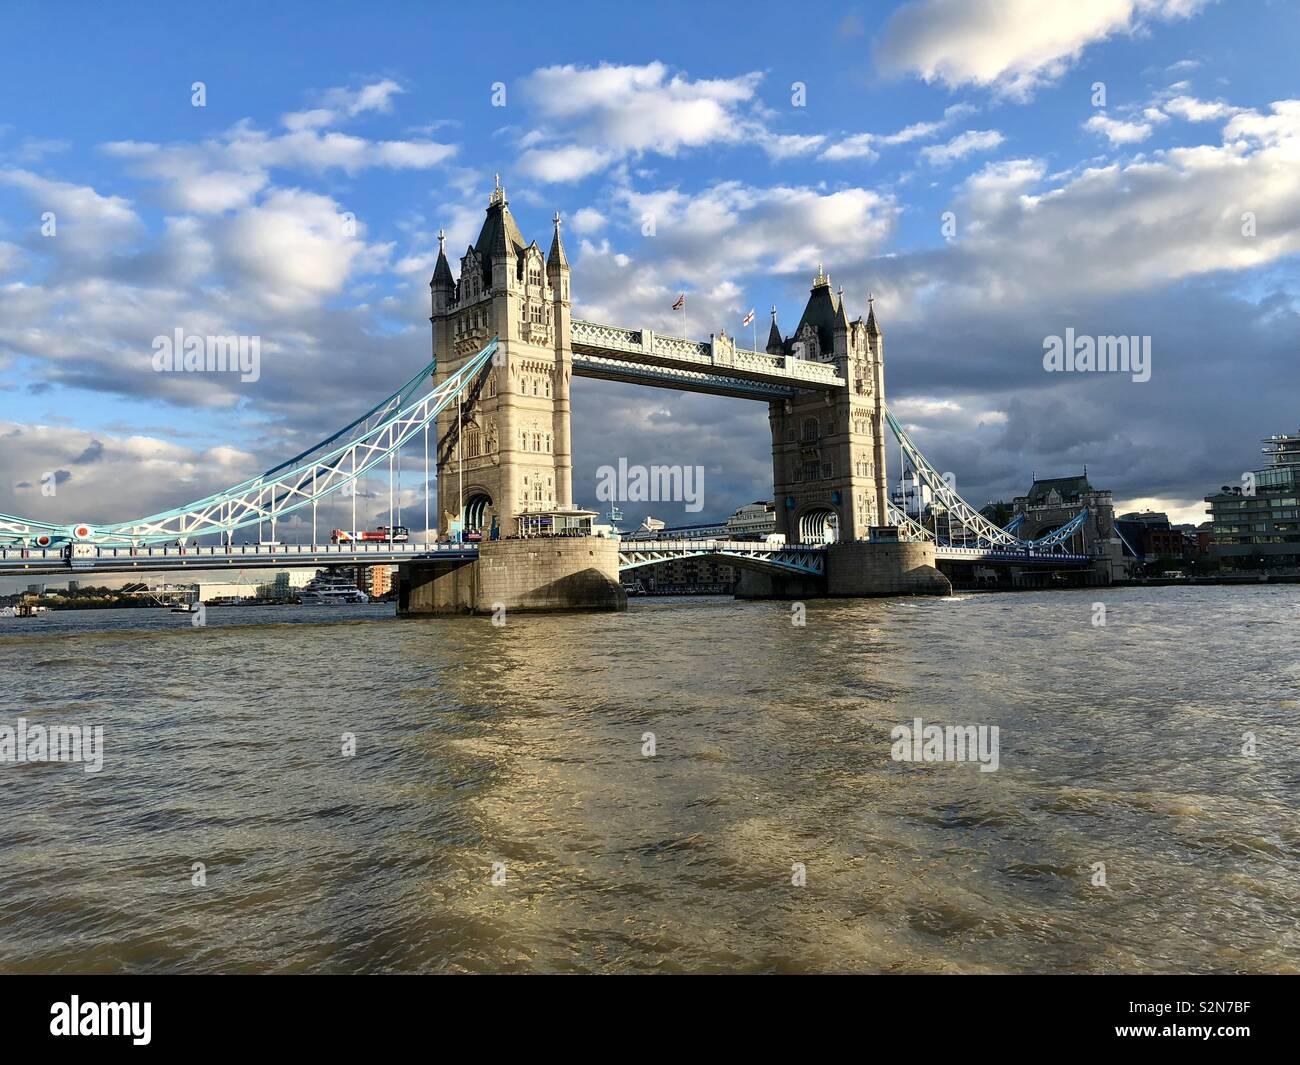 Sun shines on Tower Bridge - Stock Image